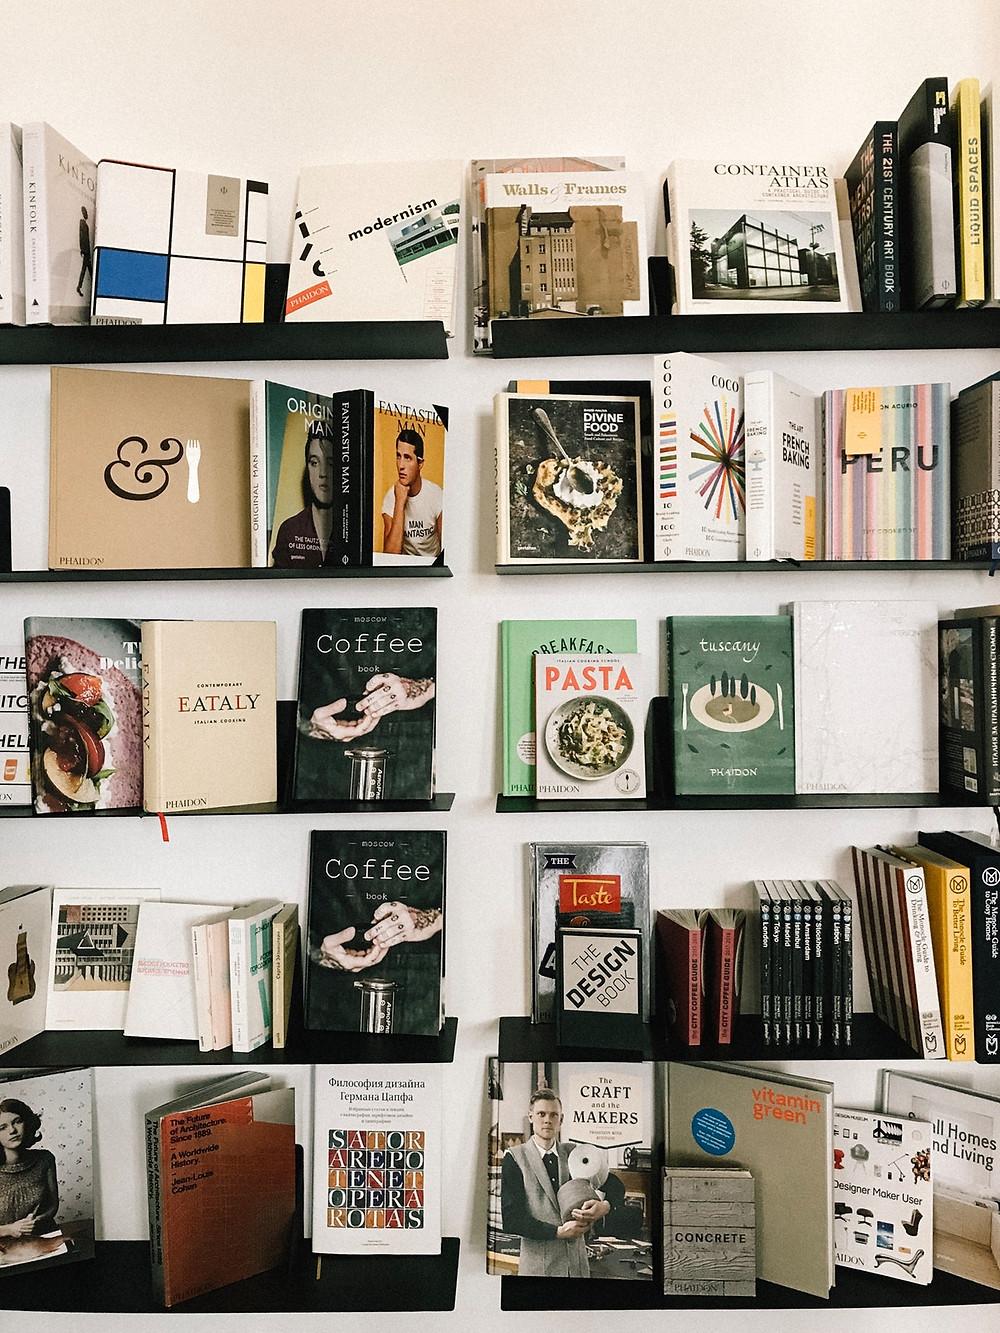 bookshelf with books and magazines